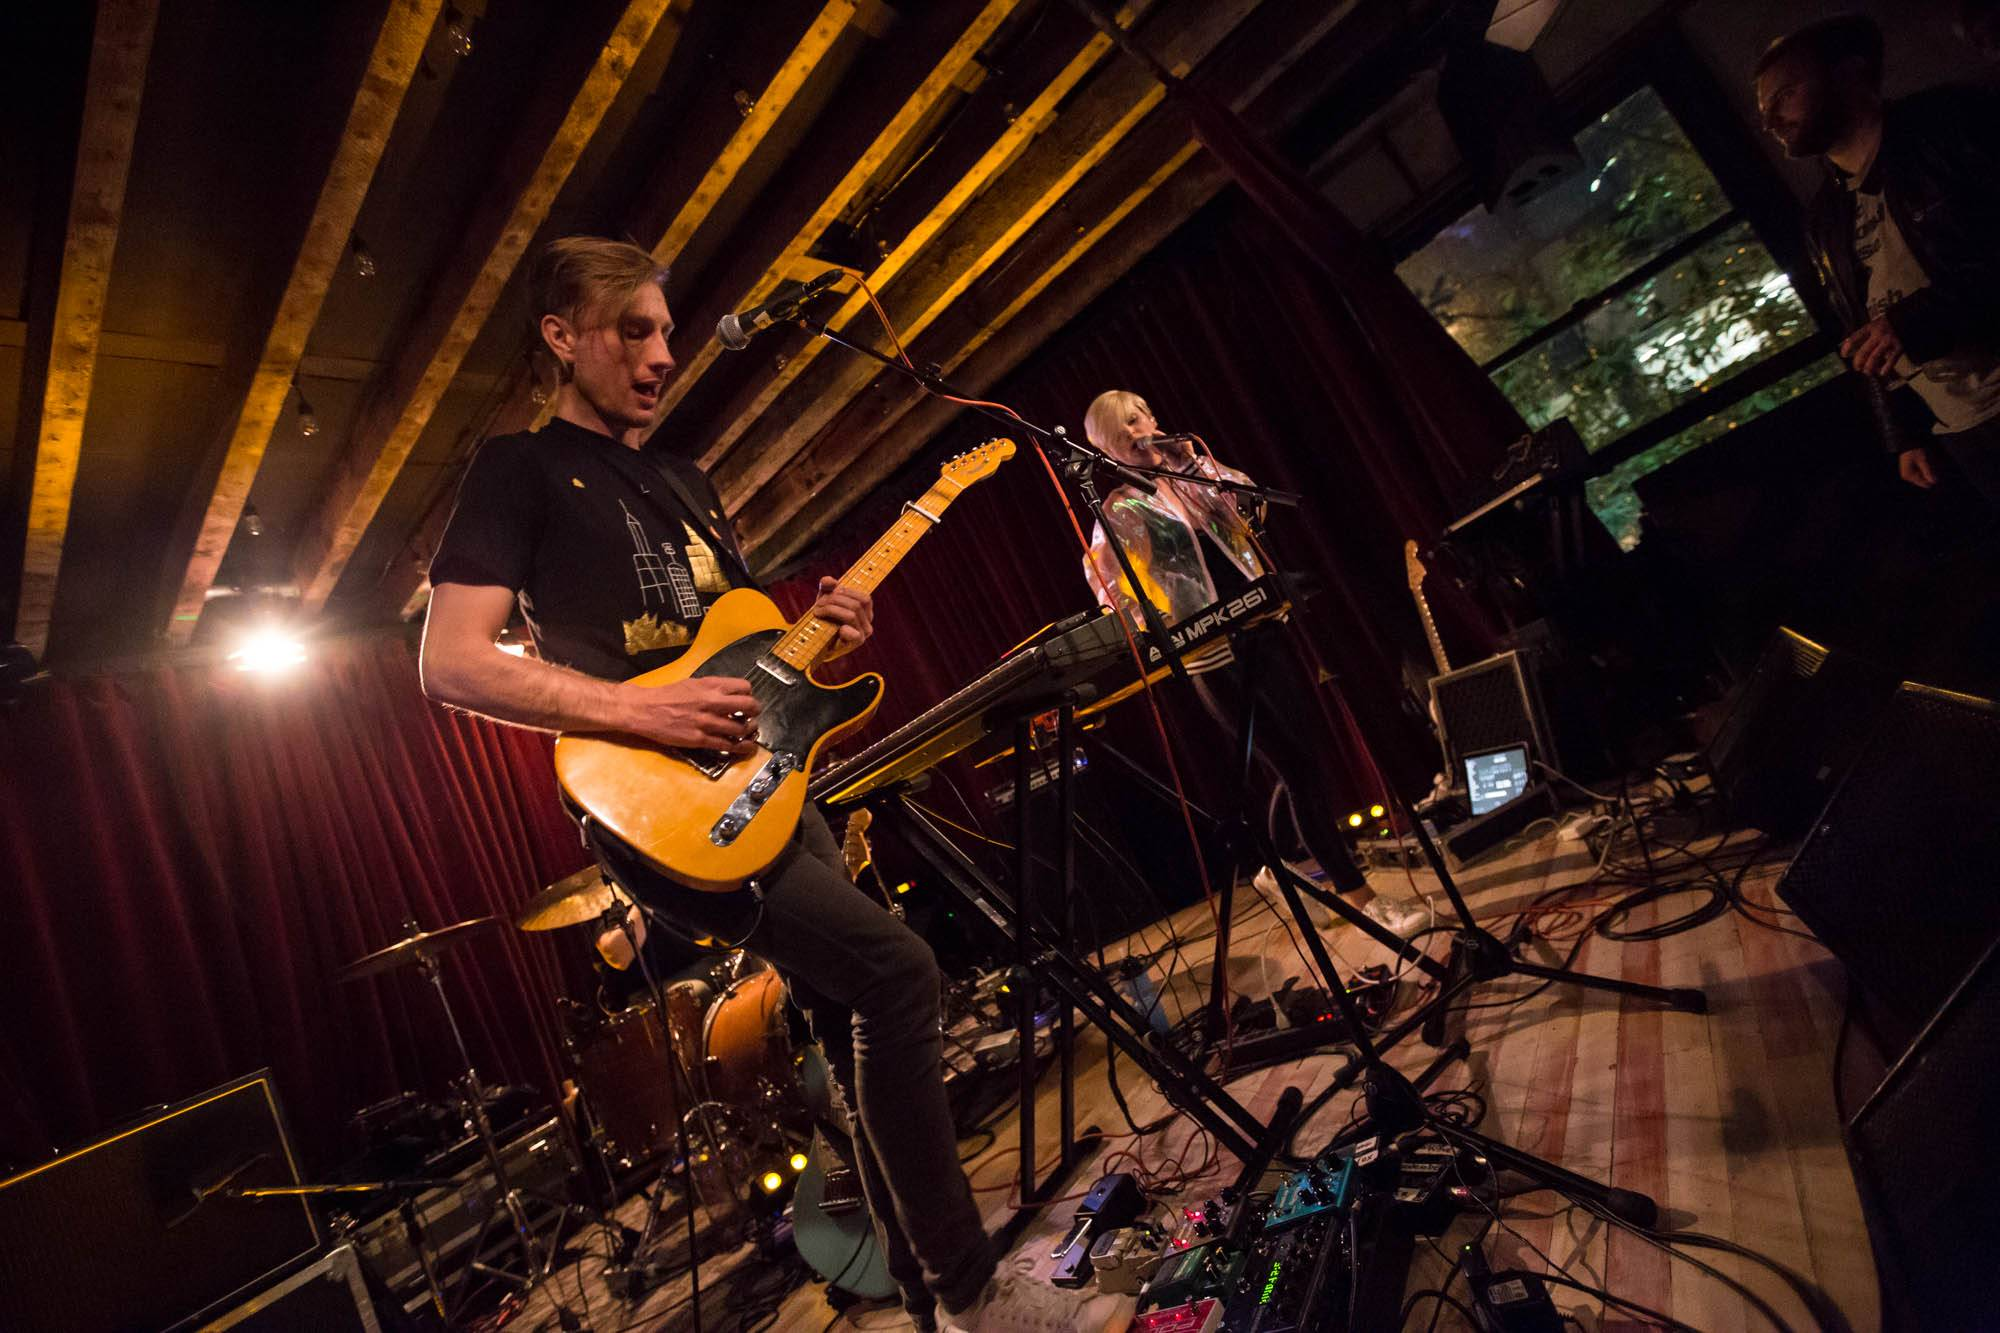 Rococode at the Railway Club, Vancouver, Jun. 10 2017. Kirk Chantraine photo.